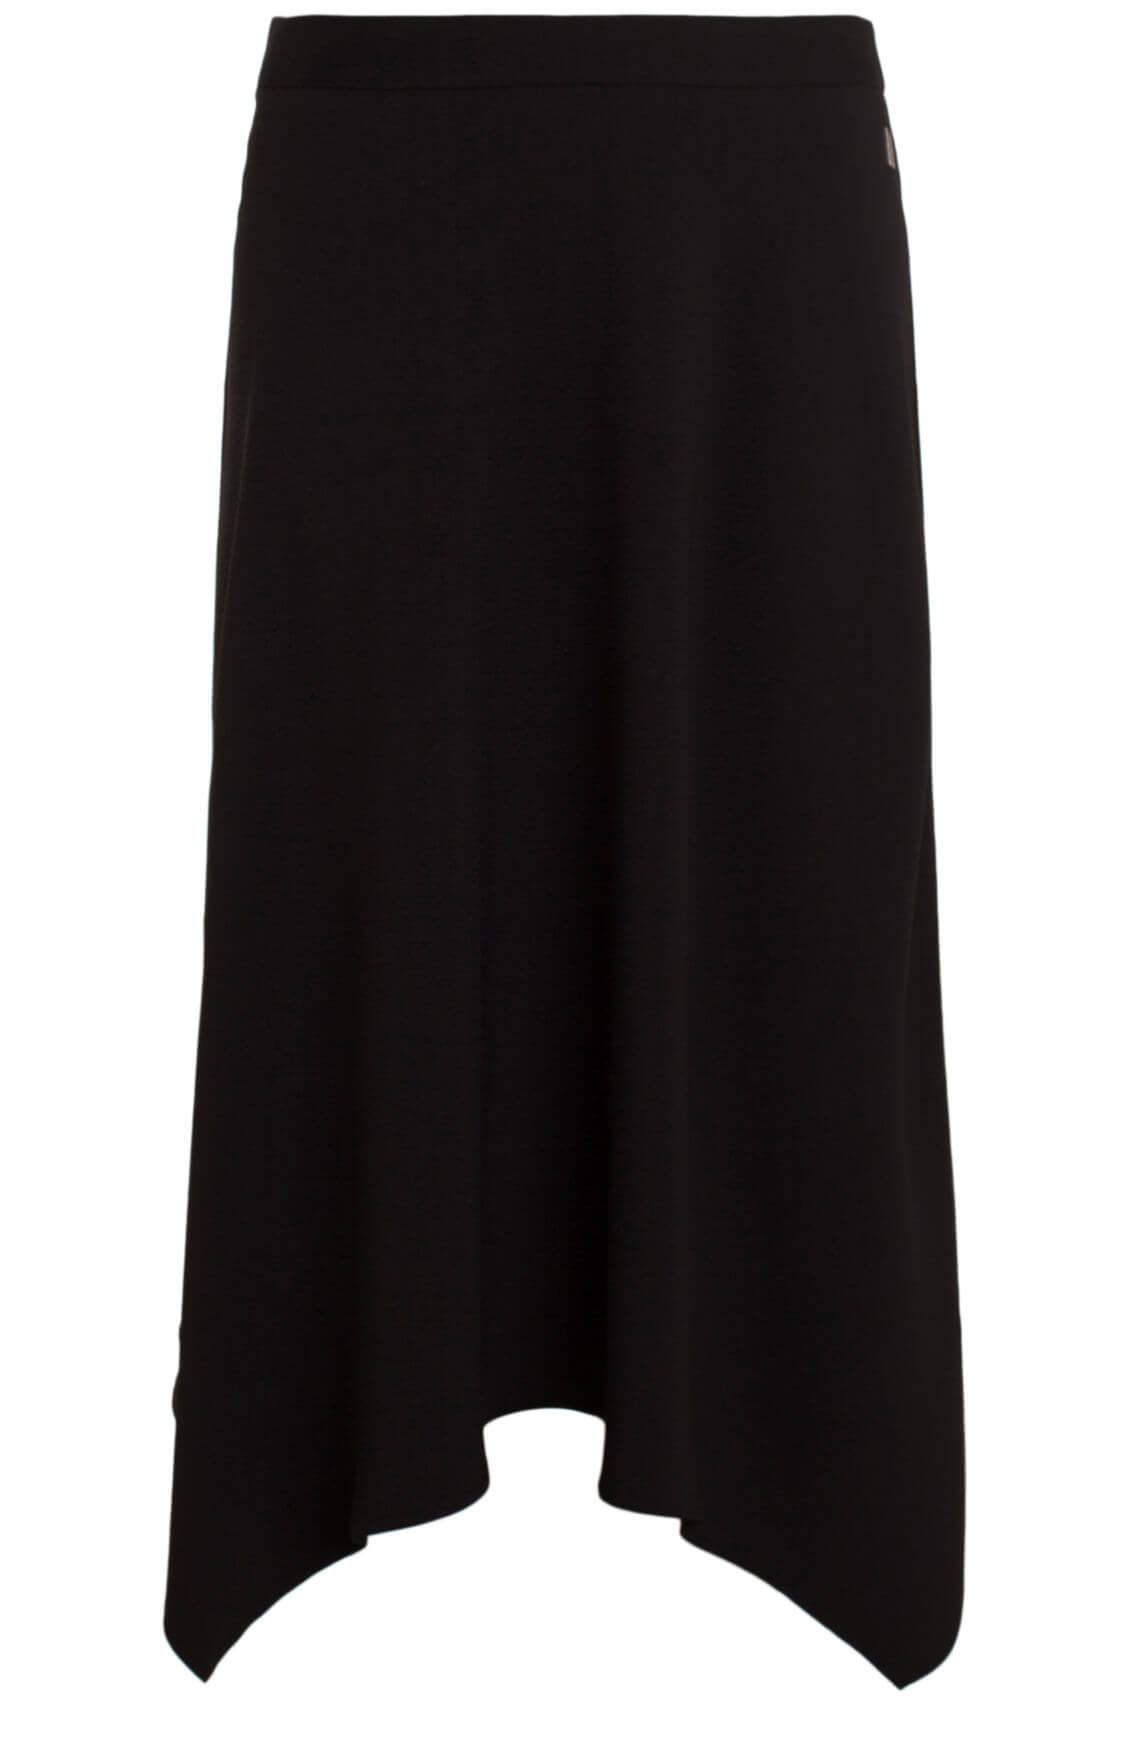 Anna Dames Asymmetrische rok zwart